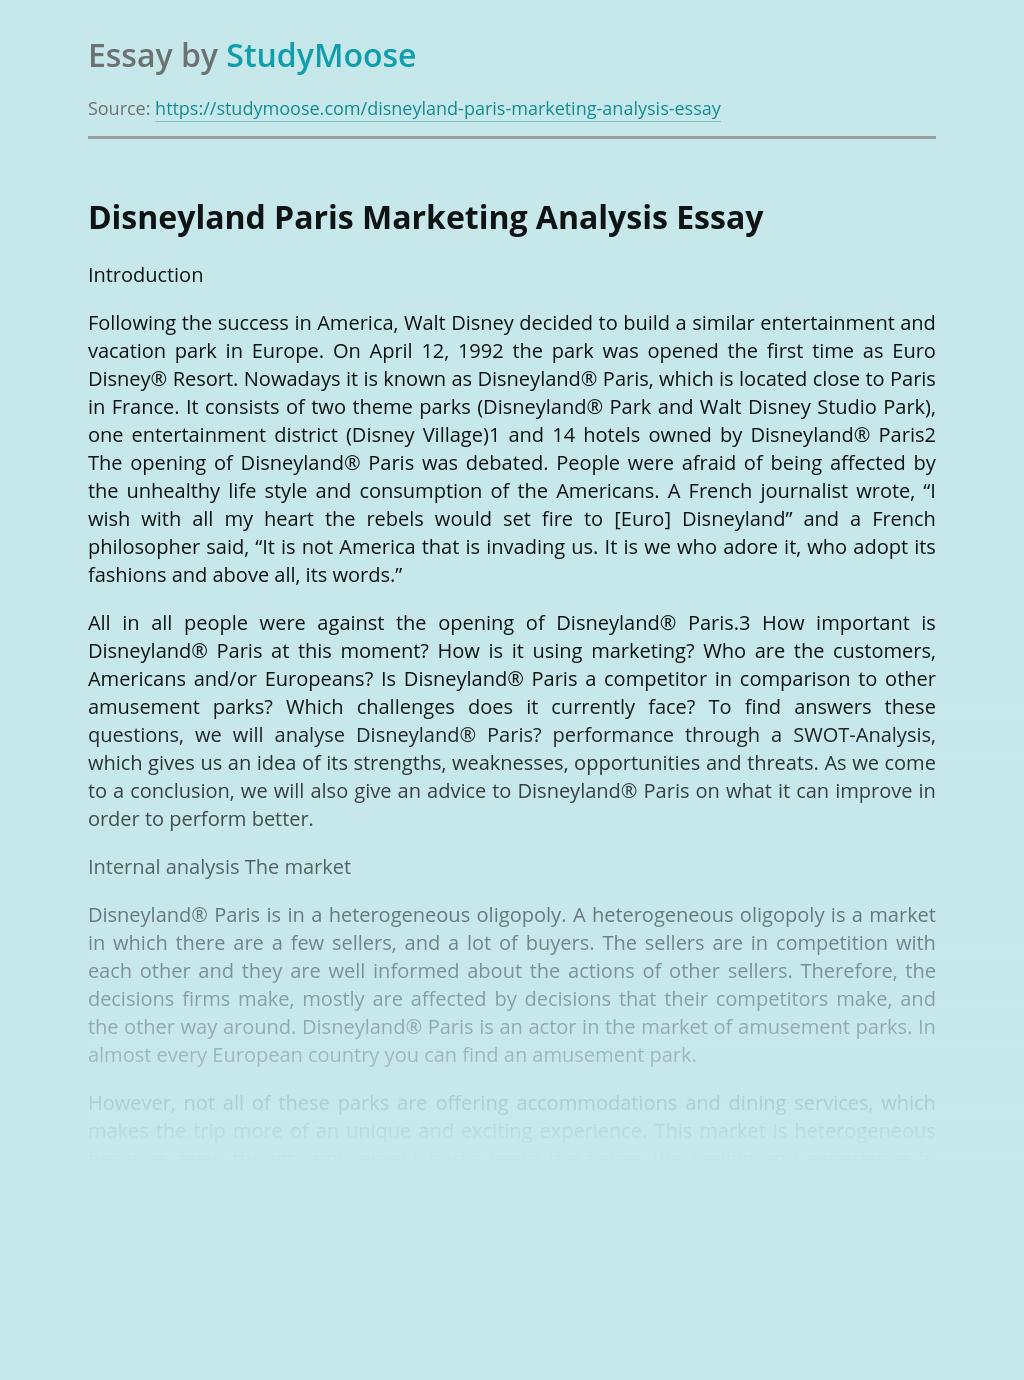 Disneyland Paris Marketing Analysis